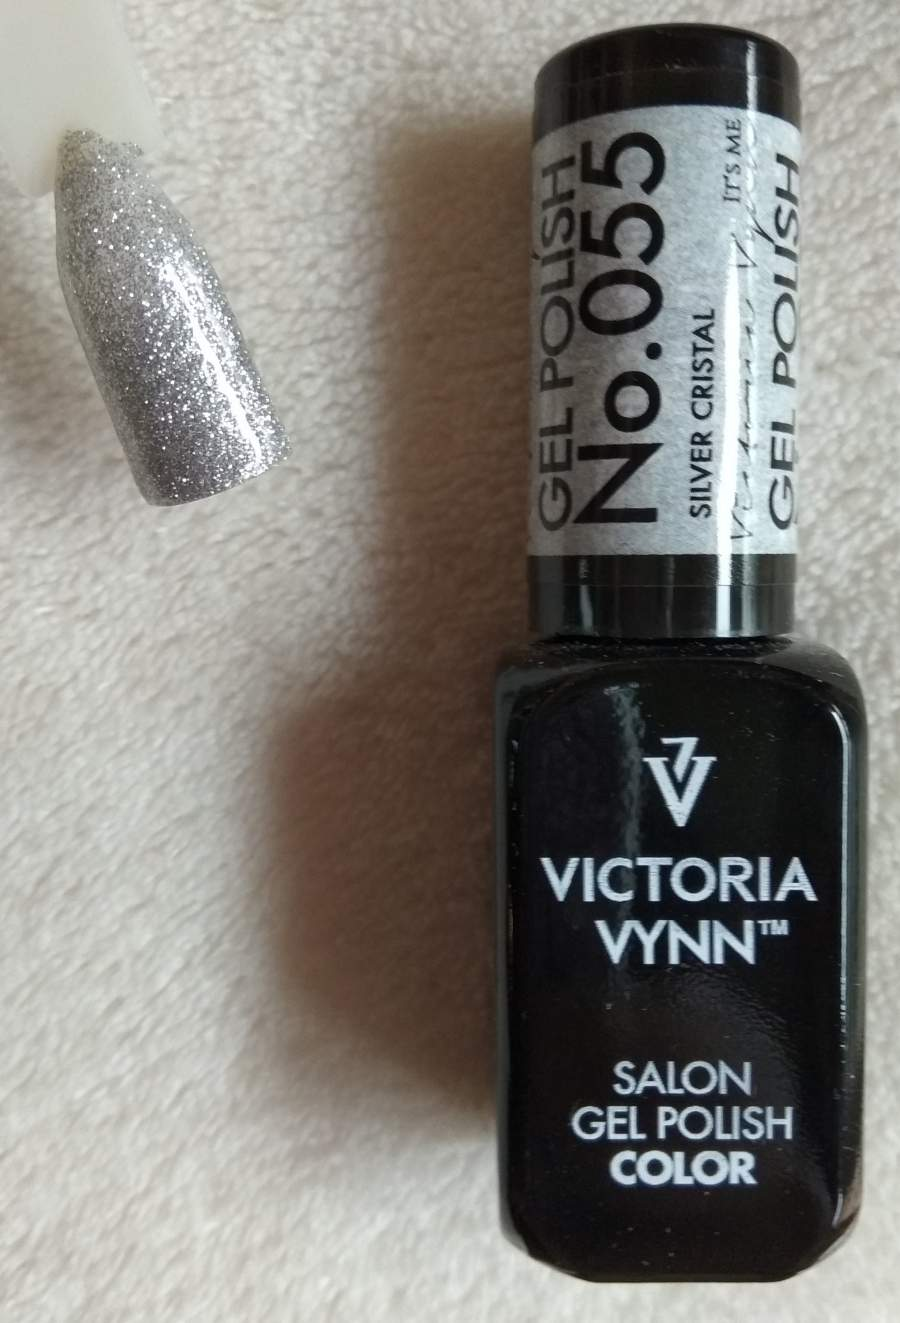 Victoria Vynn Verniz Gel Nº 055 - Silver Cristal - 8 ml